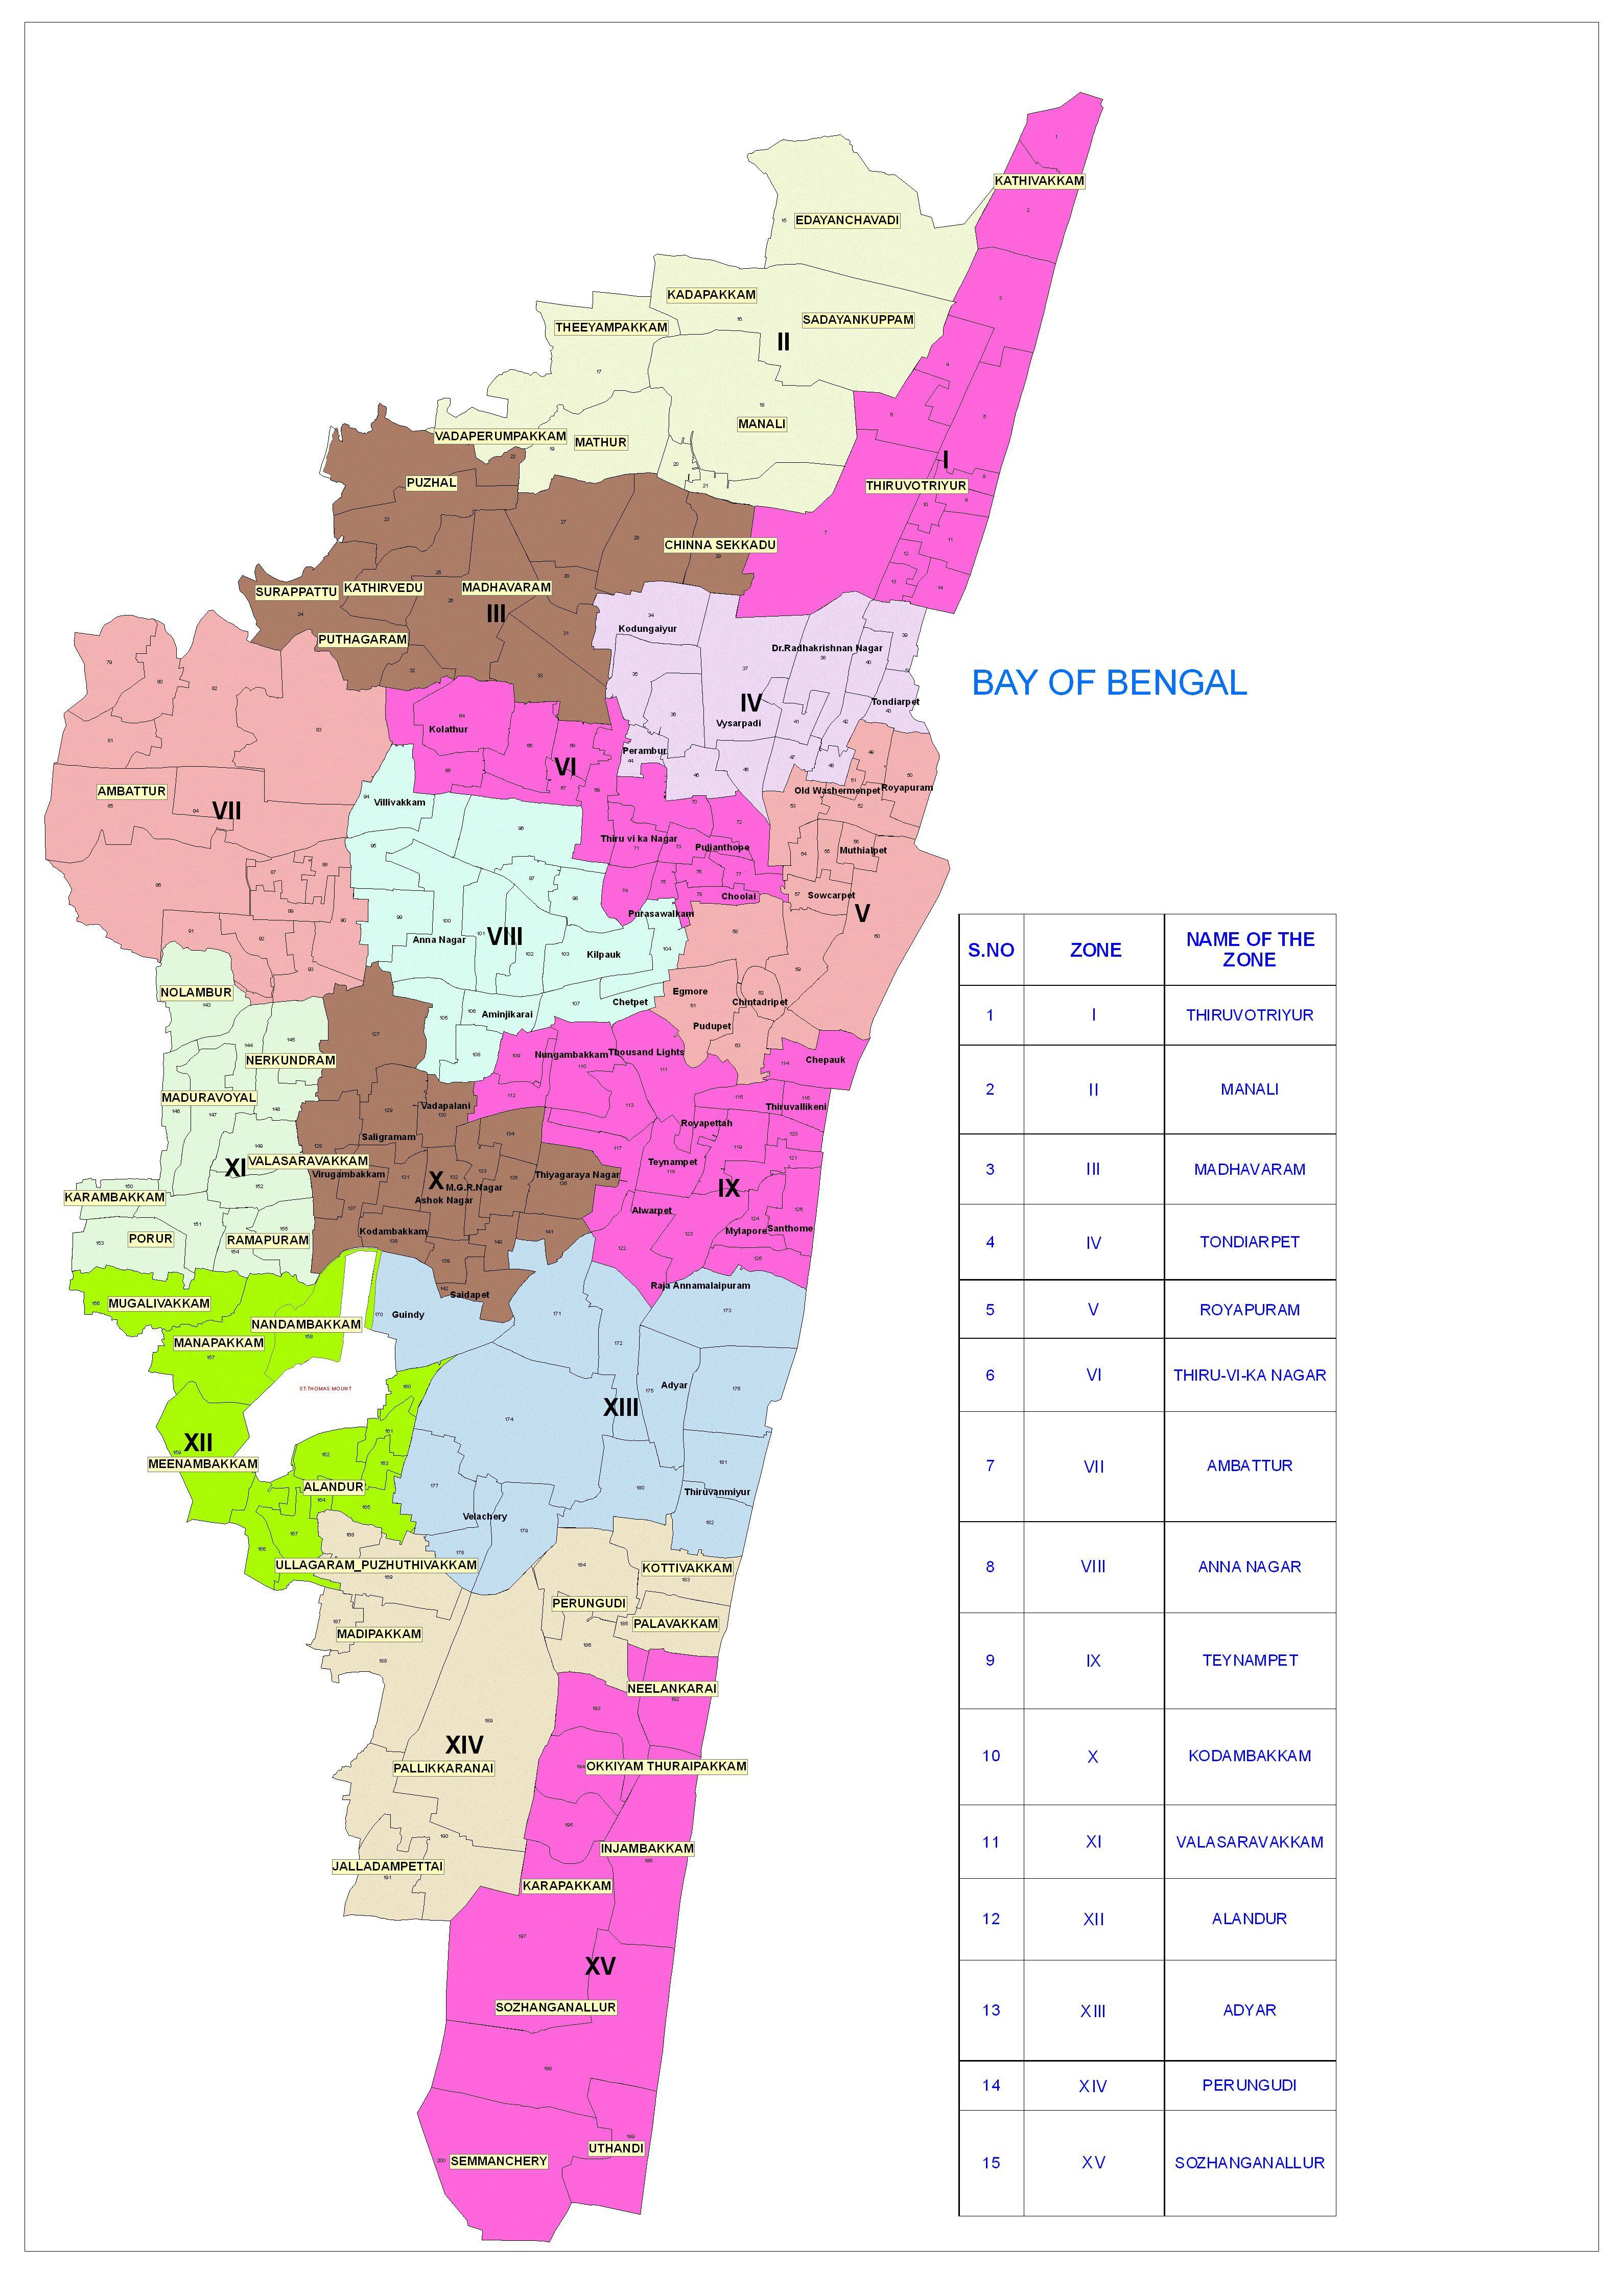 Pin by Thisismyindia on chennai map Pinterest Chennai City maps